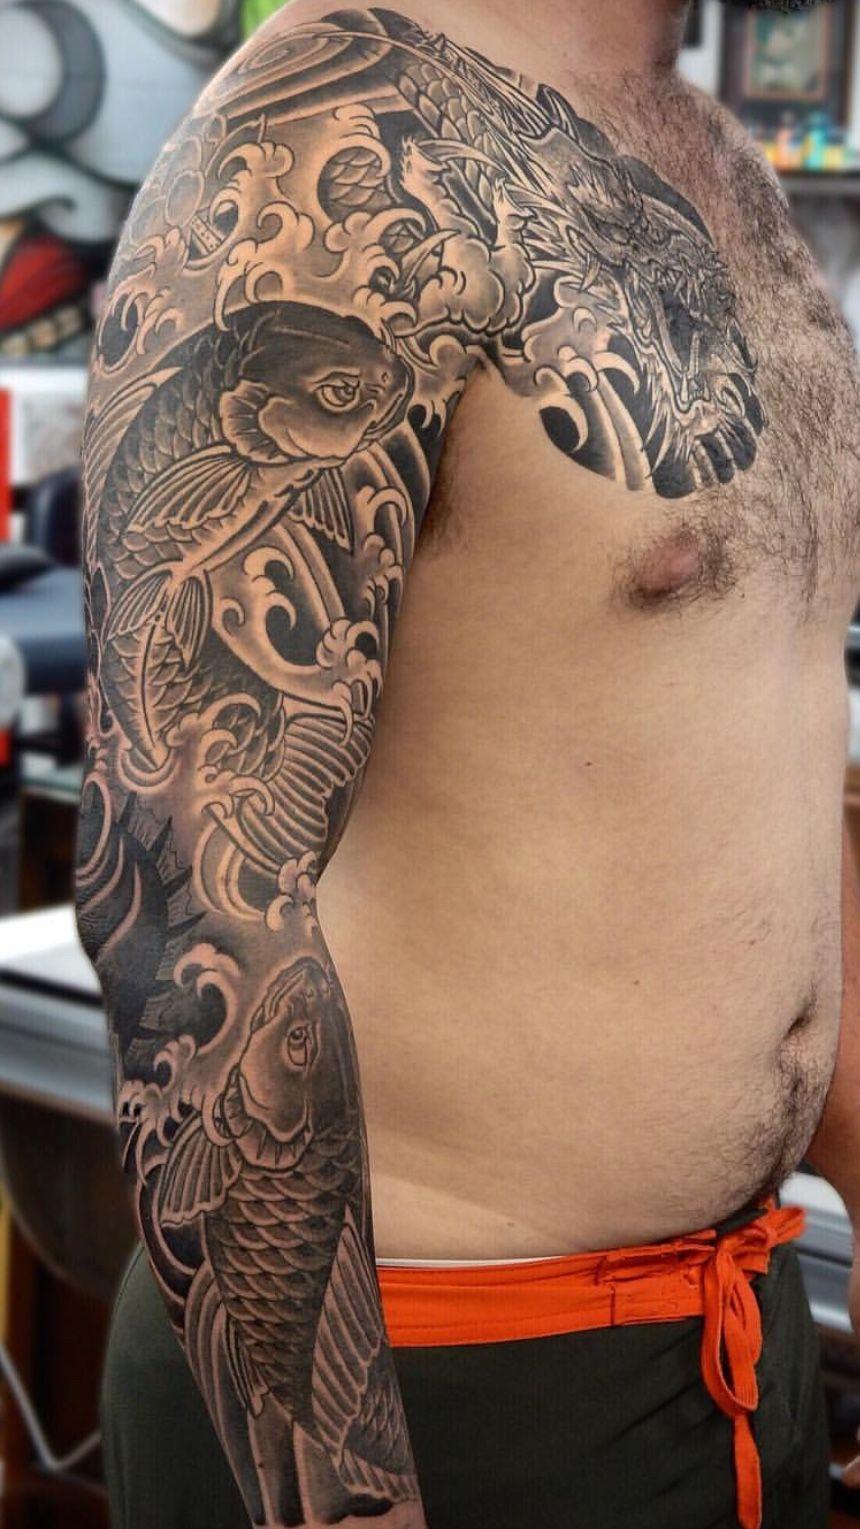 Tattoos for men koi fish кДтёρσℓє  Идеи для татуировок  pinterest  tattoos koi fish